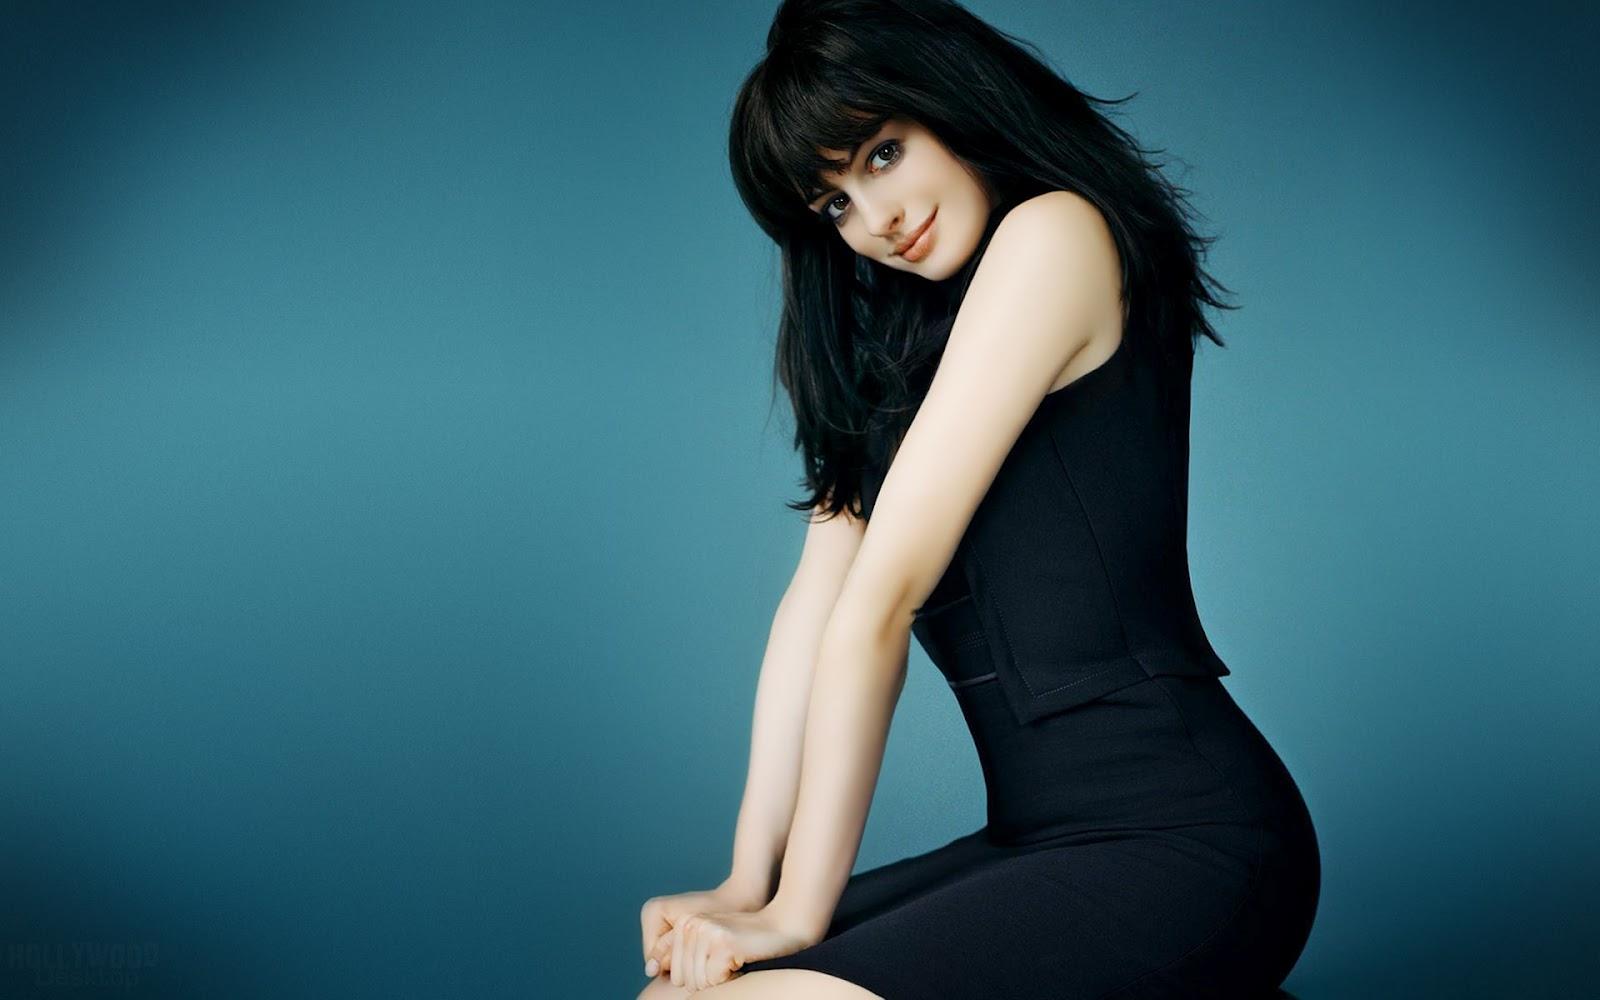 http://4.bp.blogspot.com/-9RPmuL4dUrU/US4w_n_AN5I/AAAAAAAA39Q/MBPhY7z6a6s/s1600/Anne+Hathaway+hd+Wallpapers+2012_4.jpg